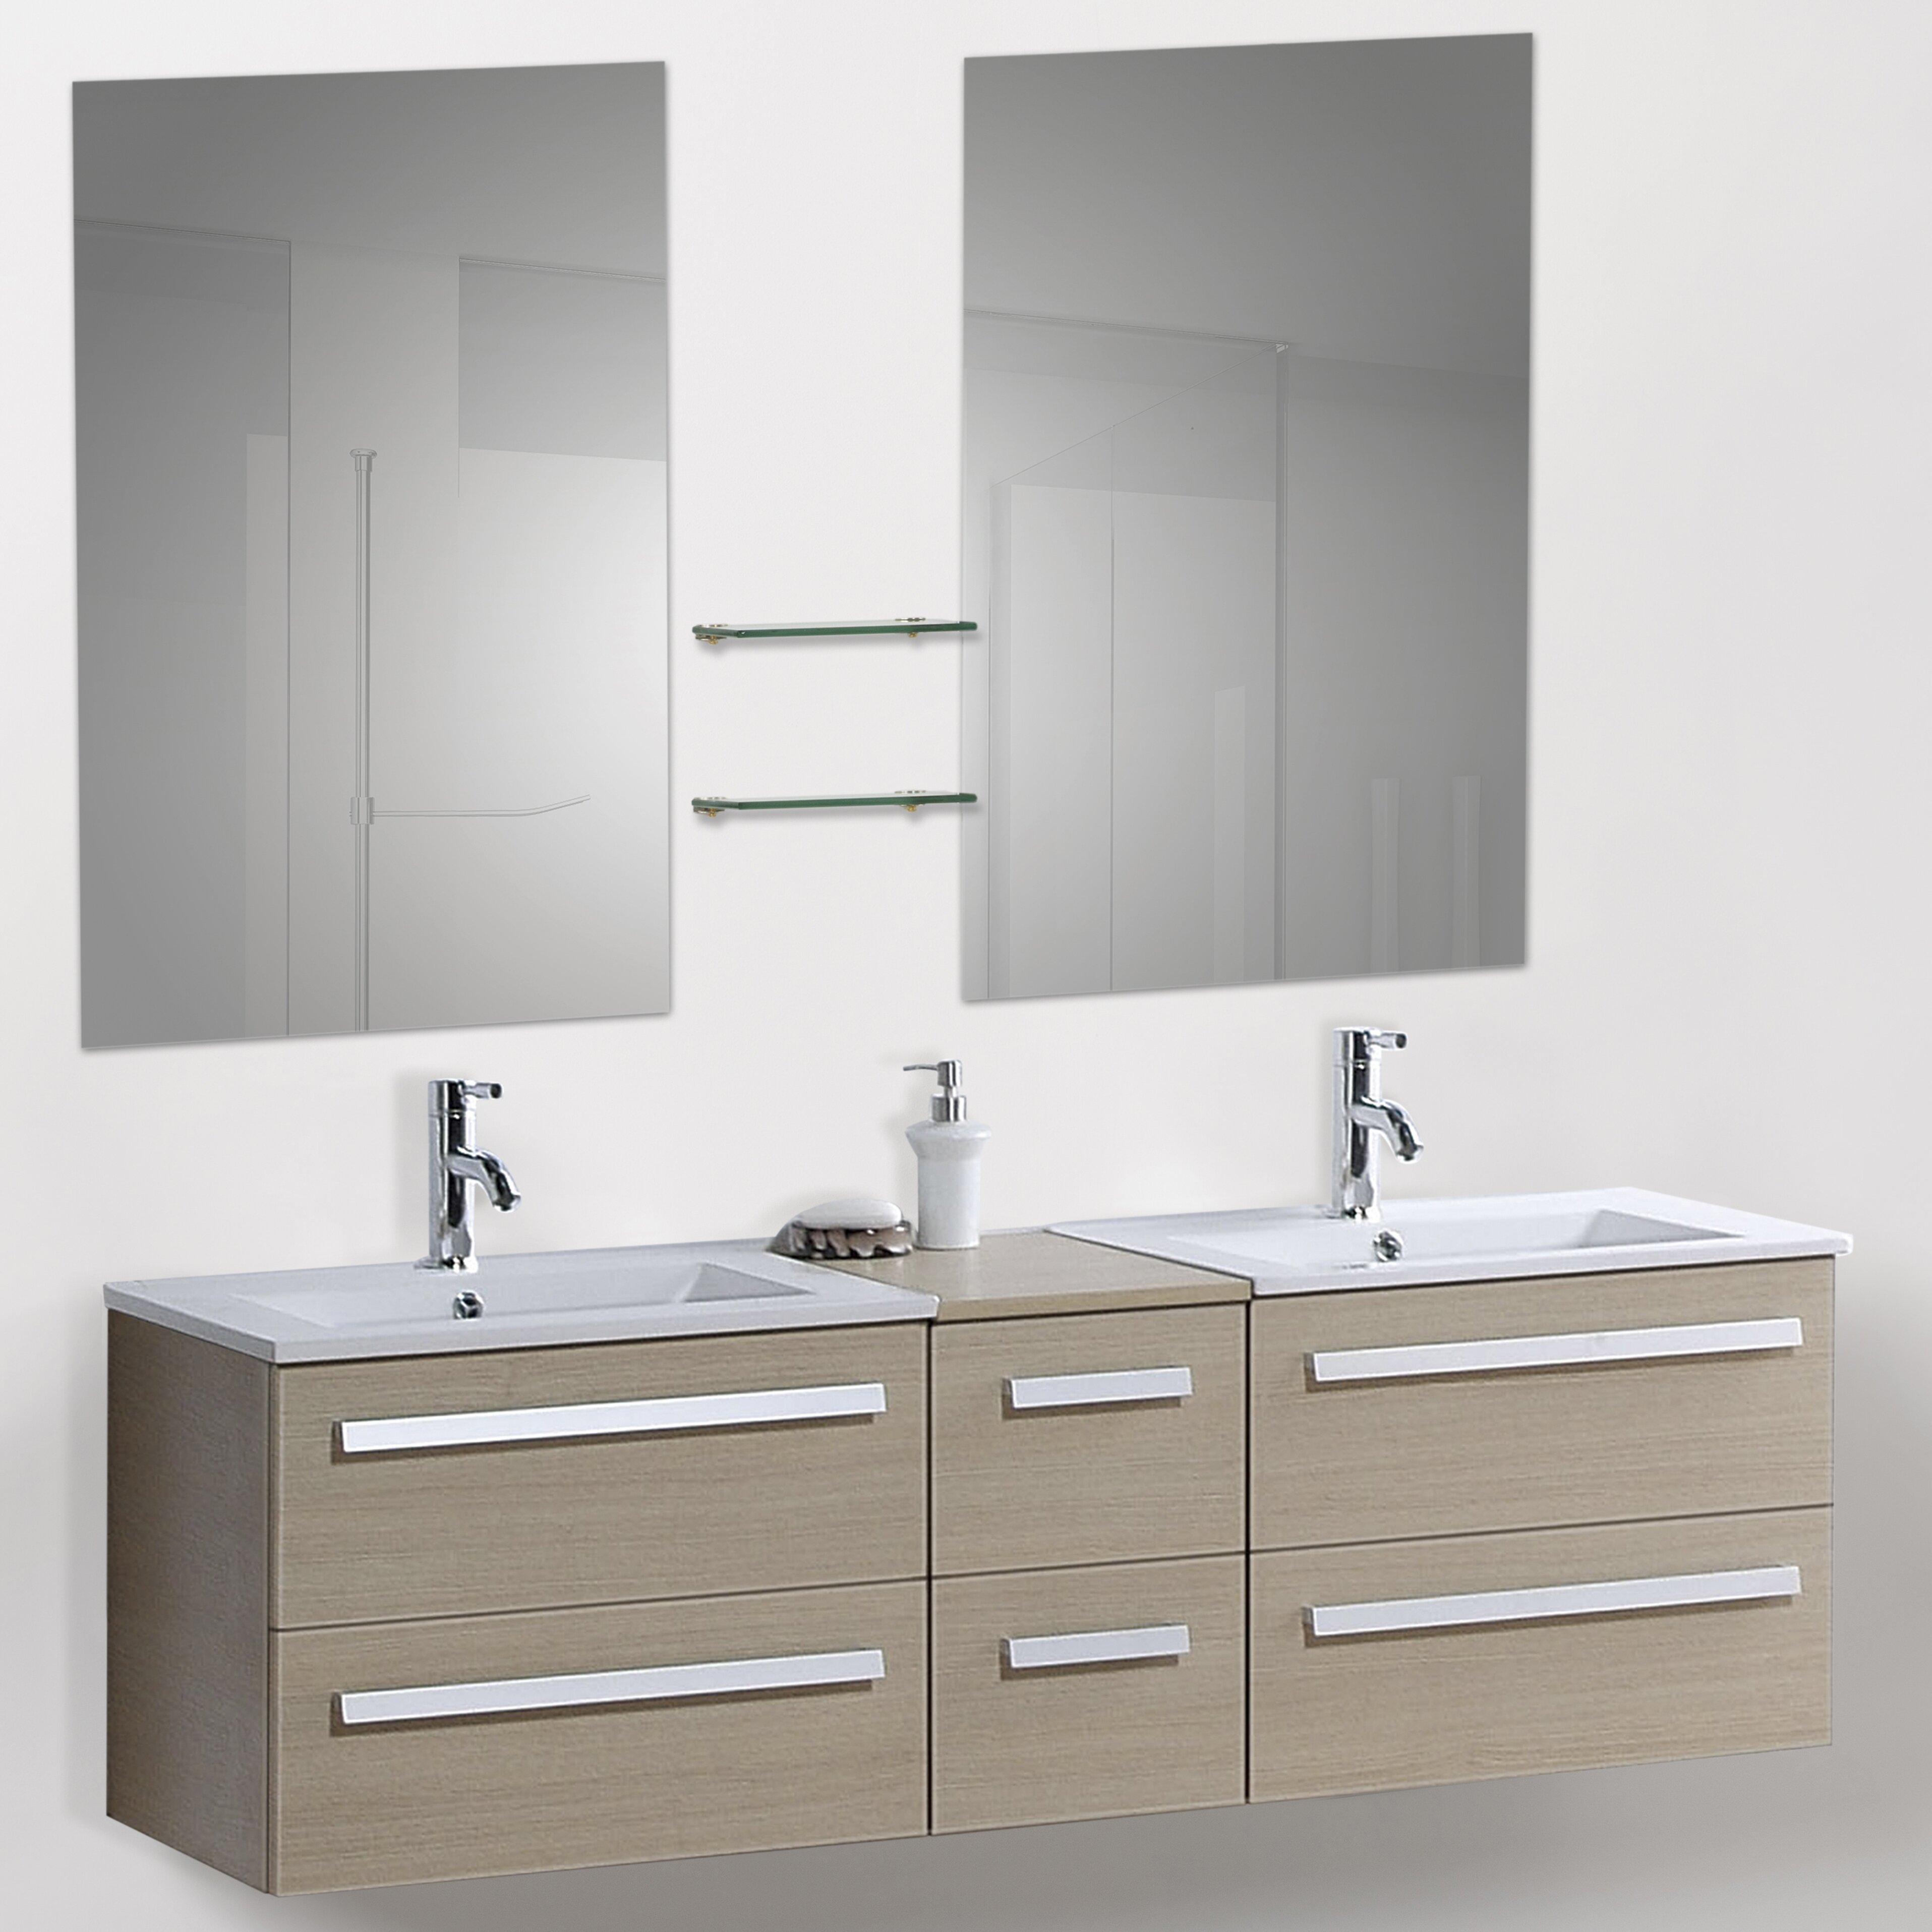 60 Modern Double Bathroom Vanity Set With Mirrors Wayfair